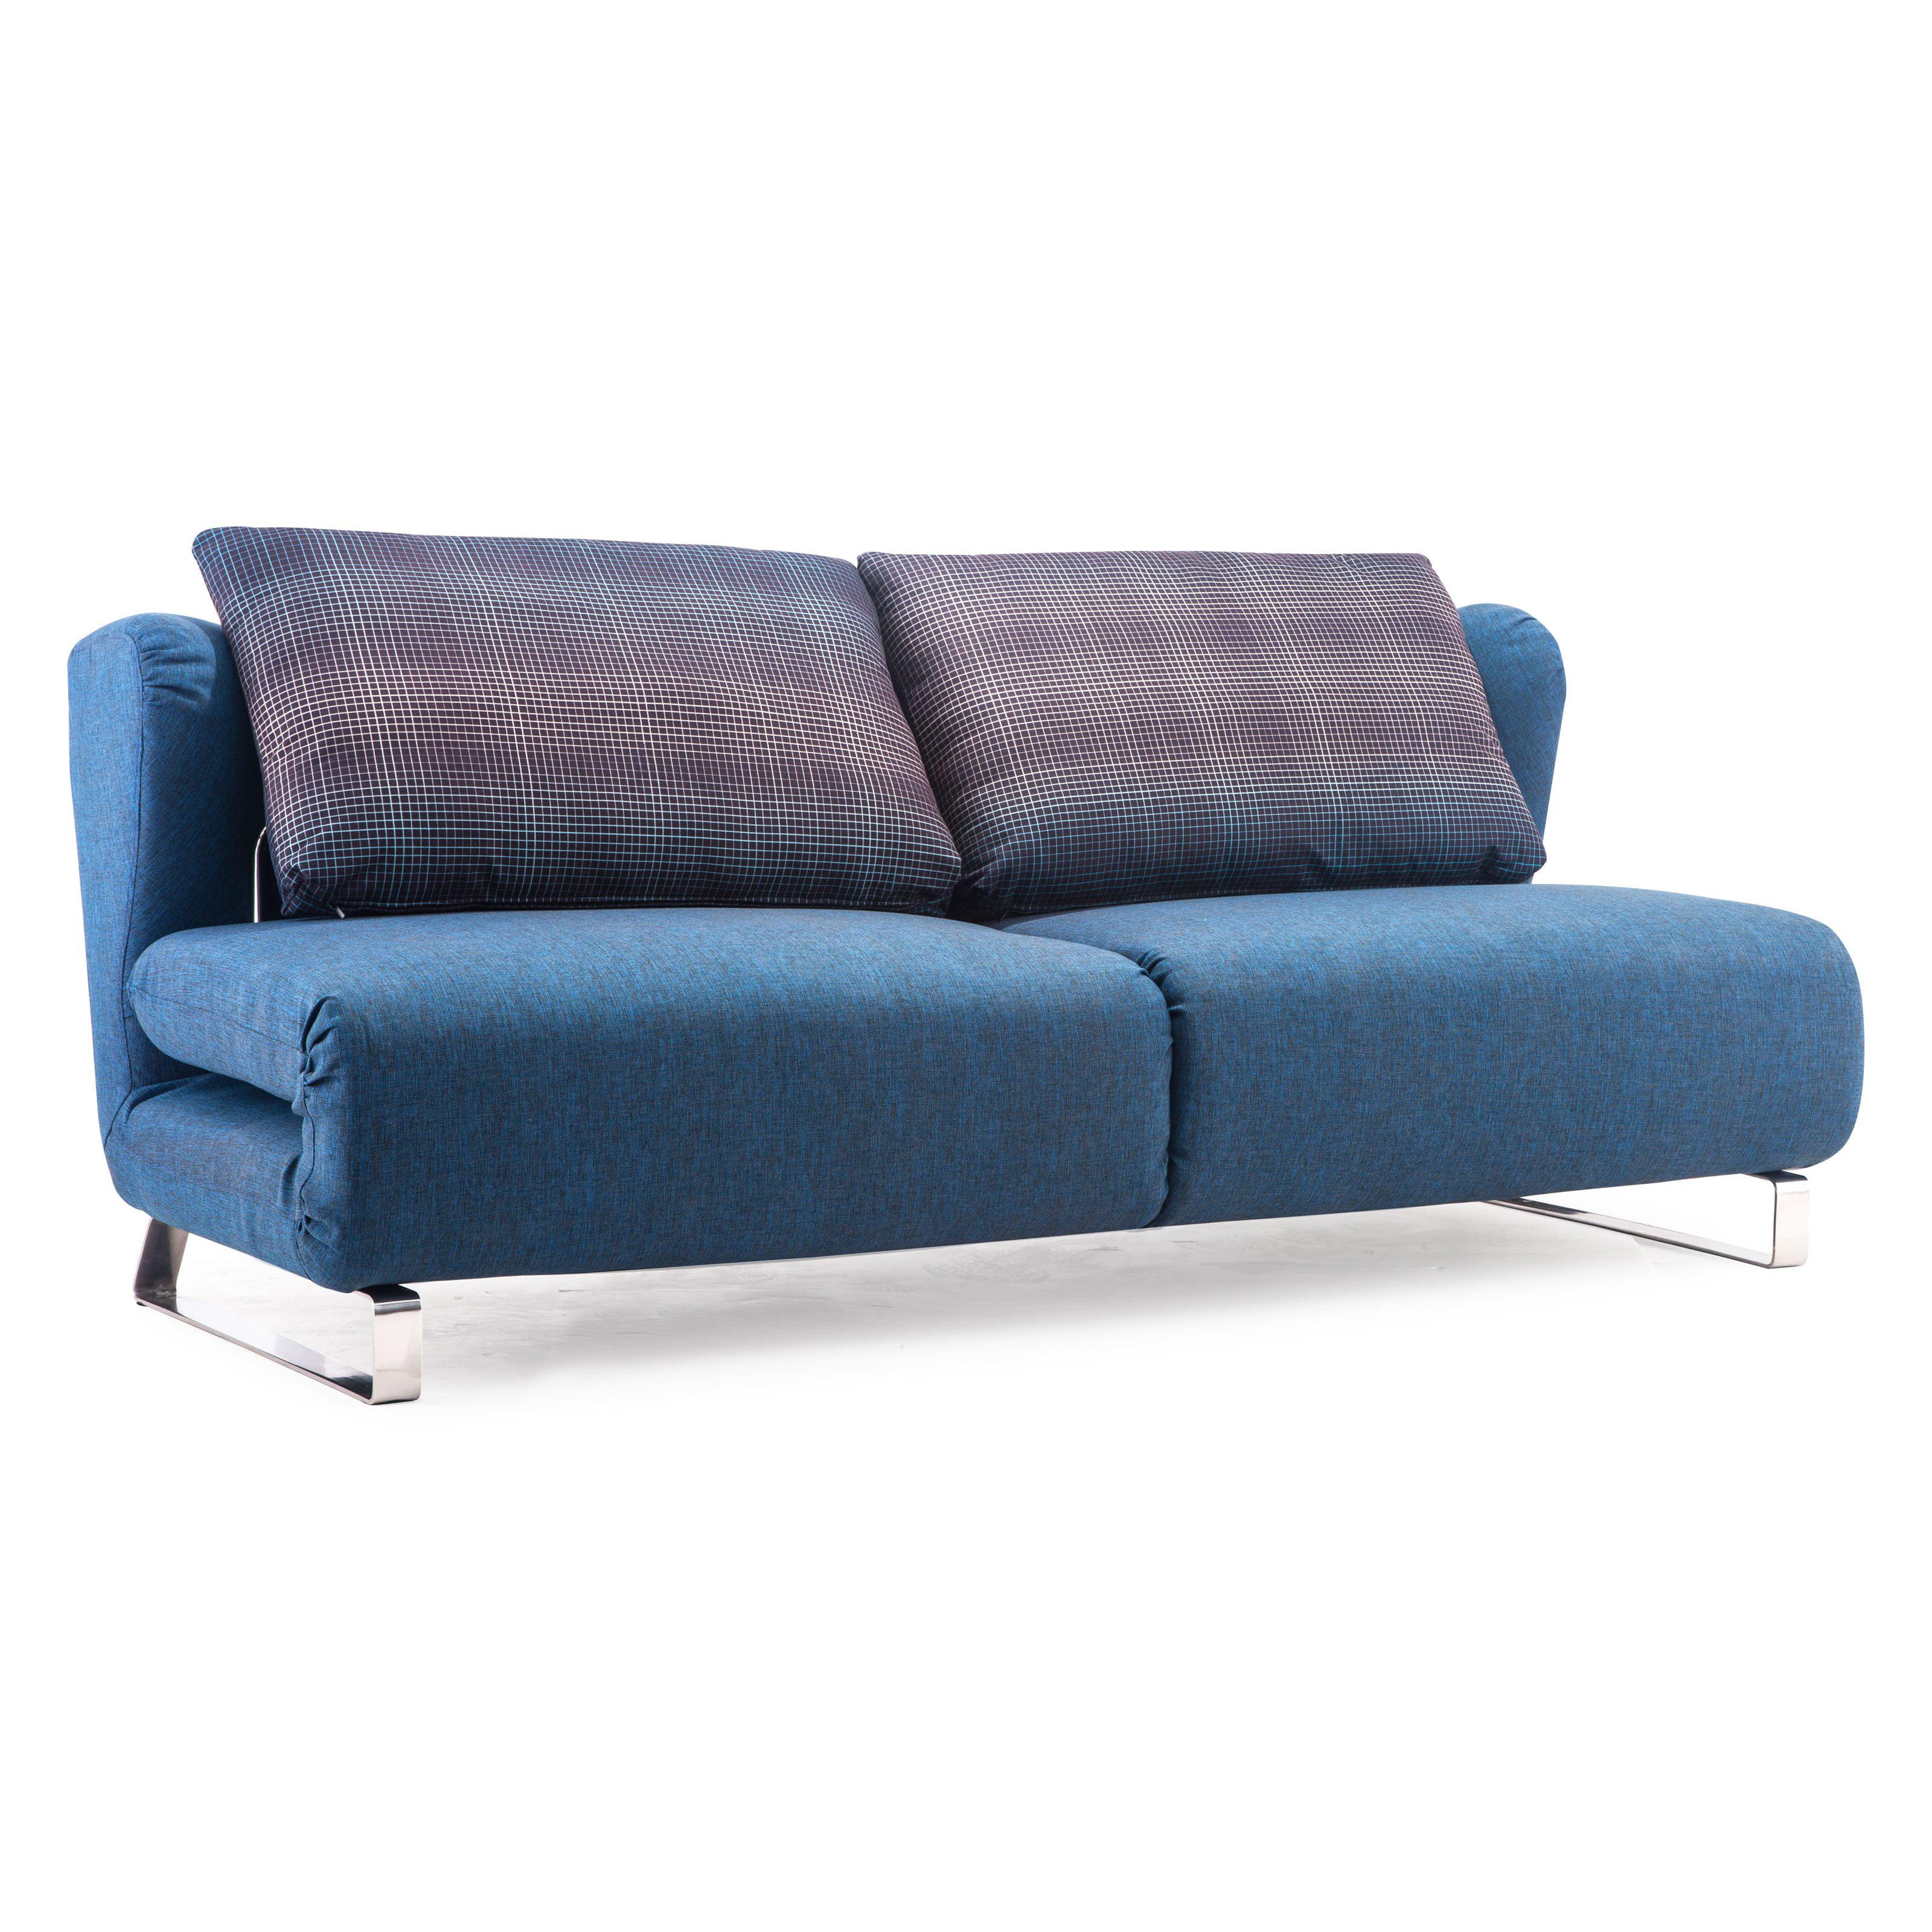 Zuo modern conic sofa sleeper walmart com